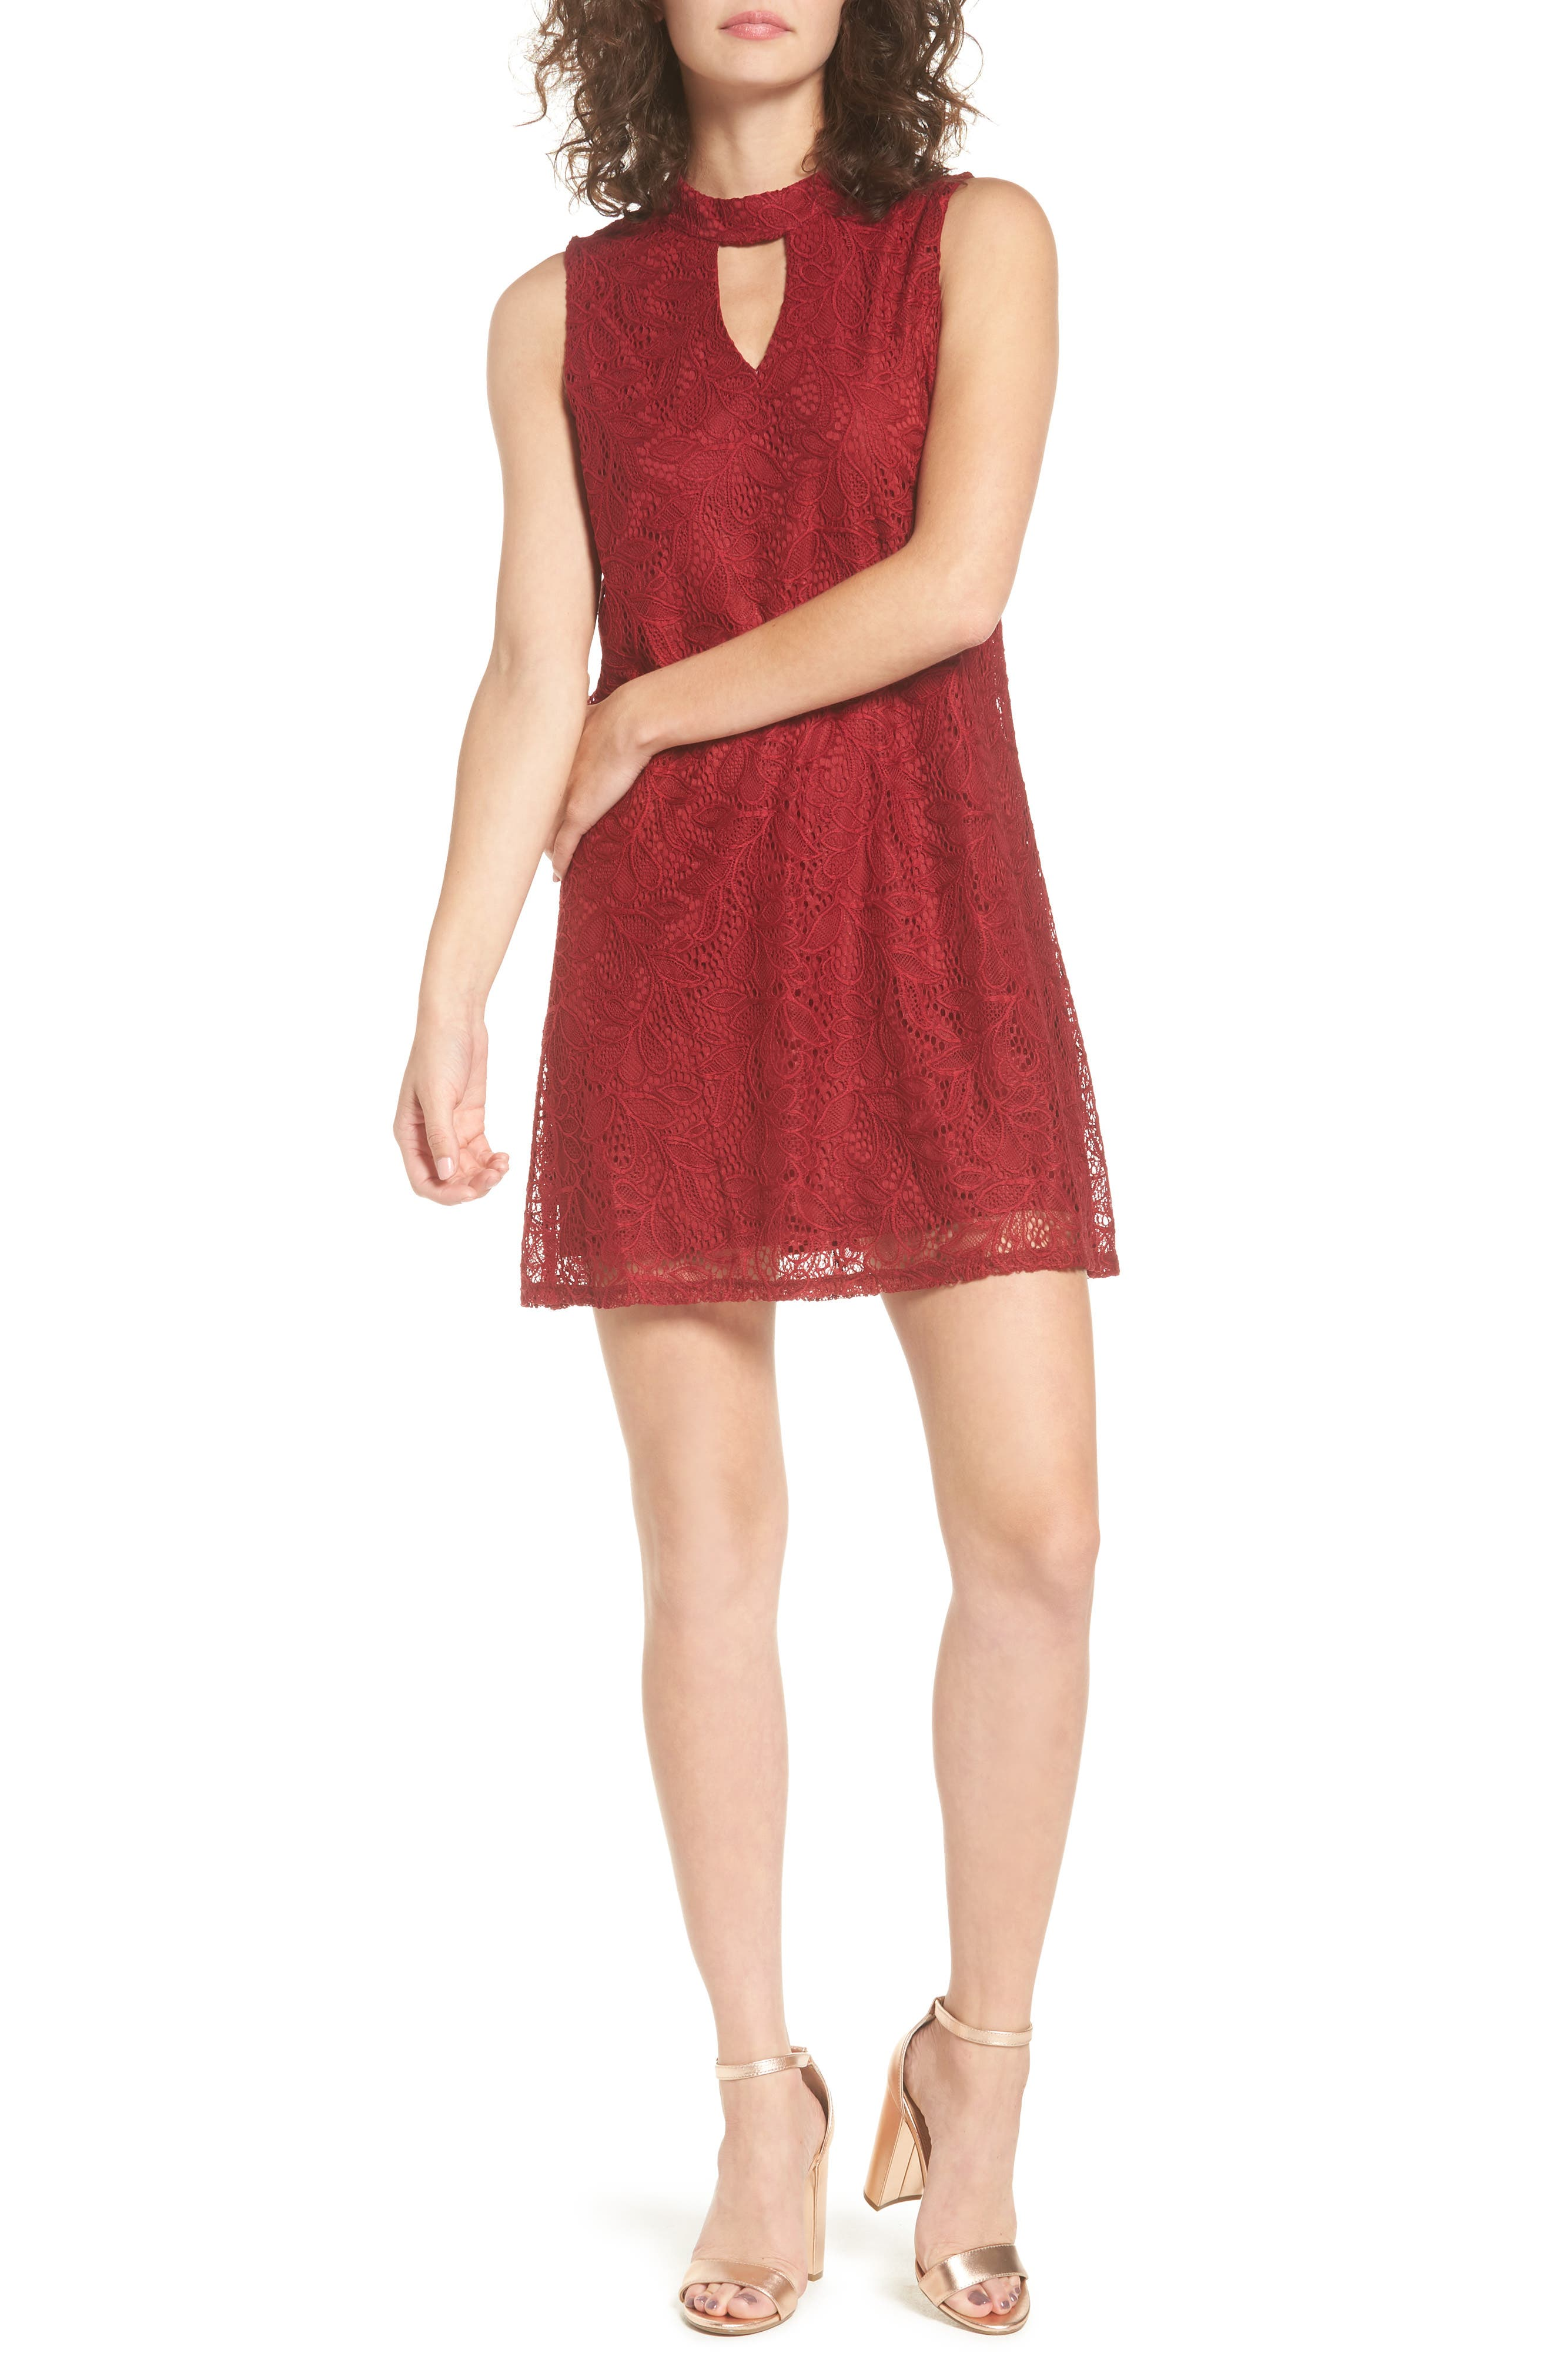 As You Wish Keyhole Lace Dress